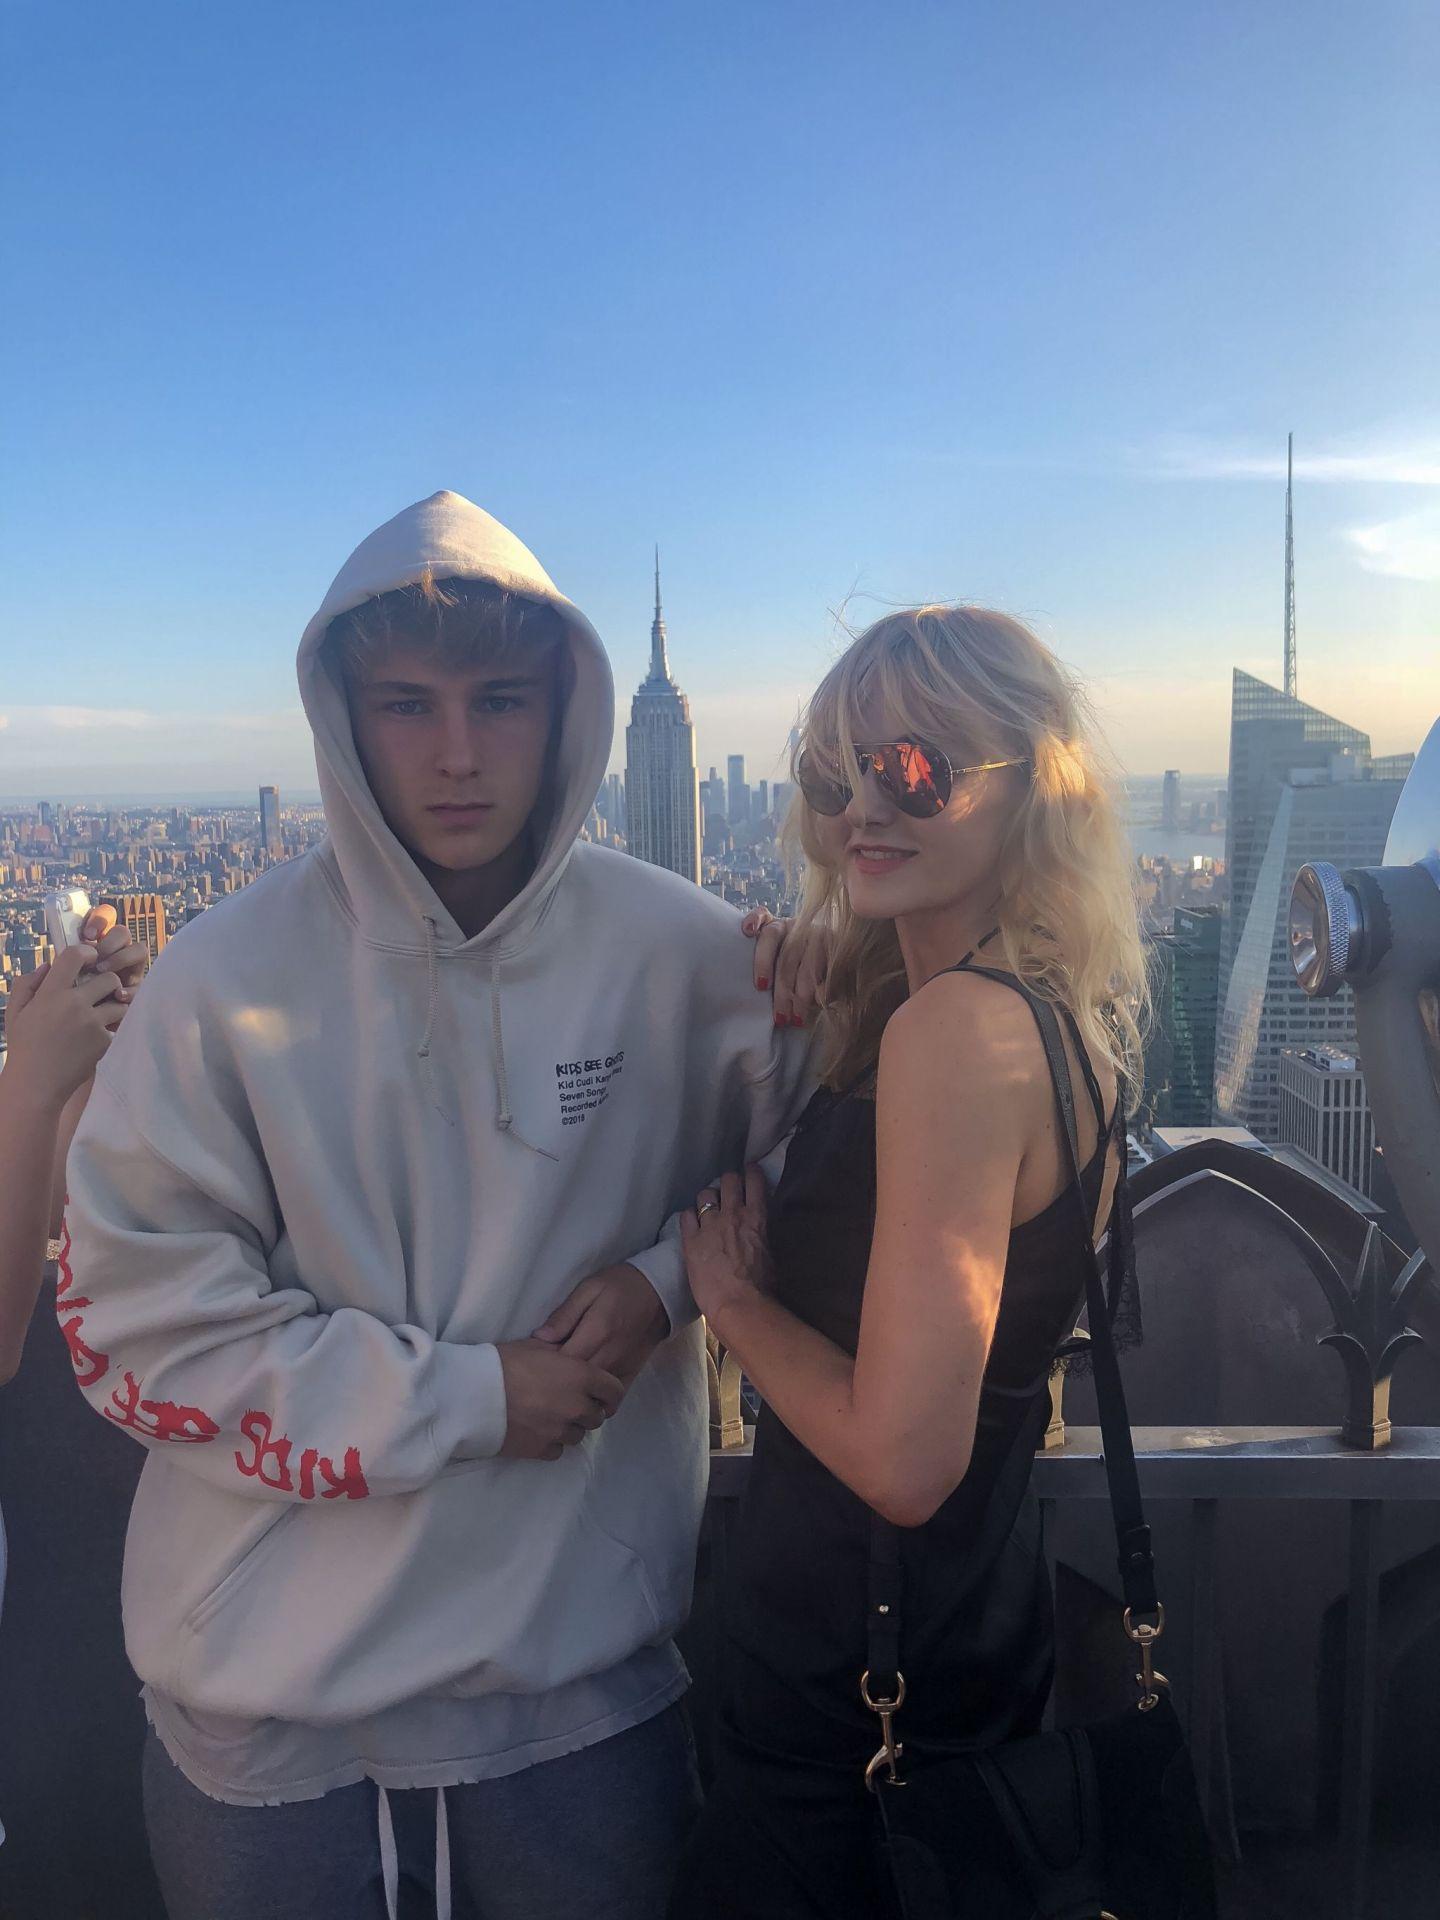 4 Tage in New York City - Top of the Rock mit Luke - Nowshine Reiseblog ü 40